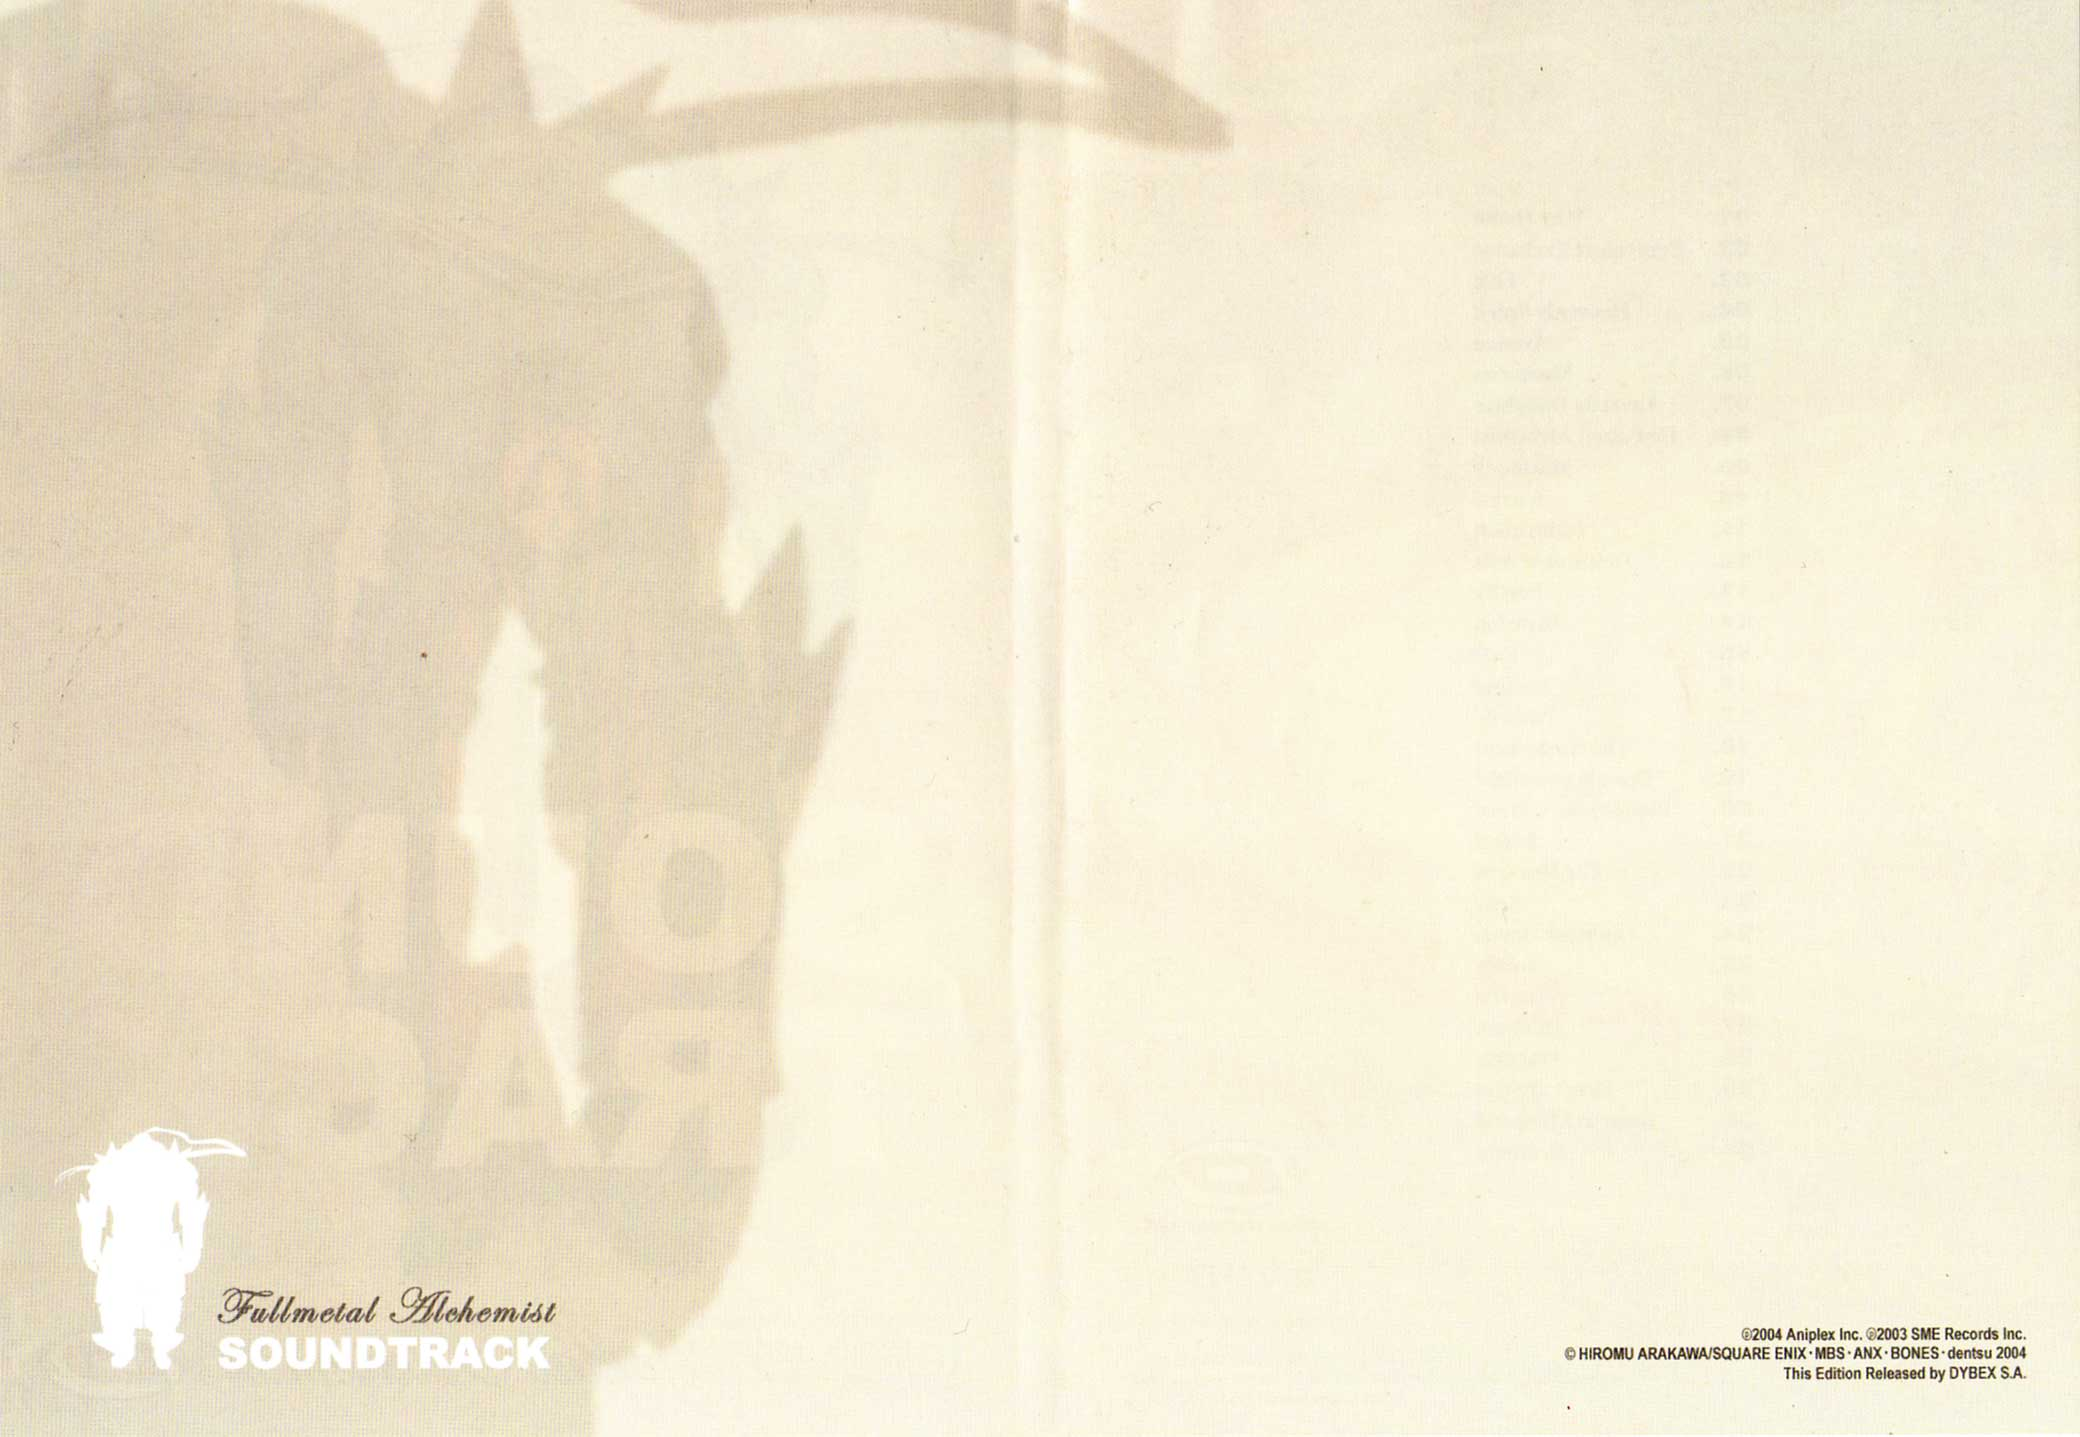 Fullmetal Alchemist OST (Dybex - 2008)